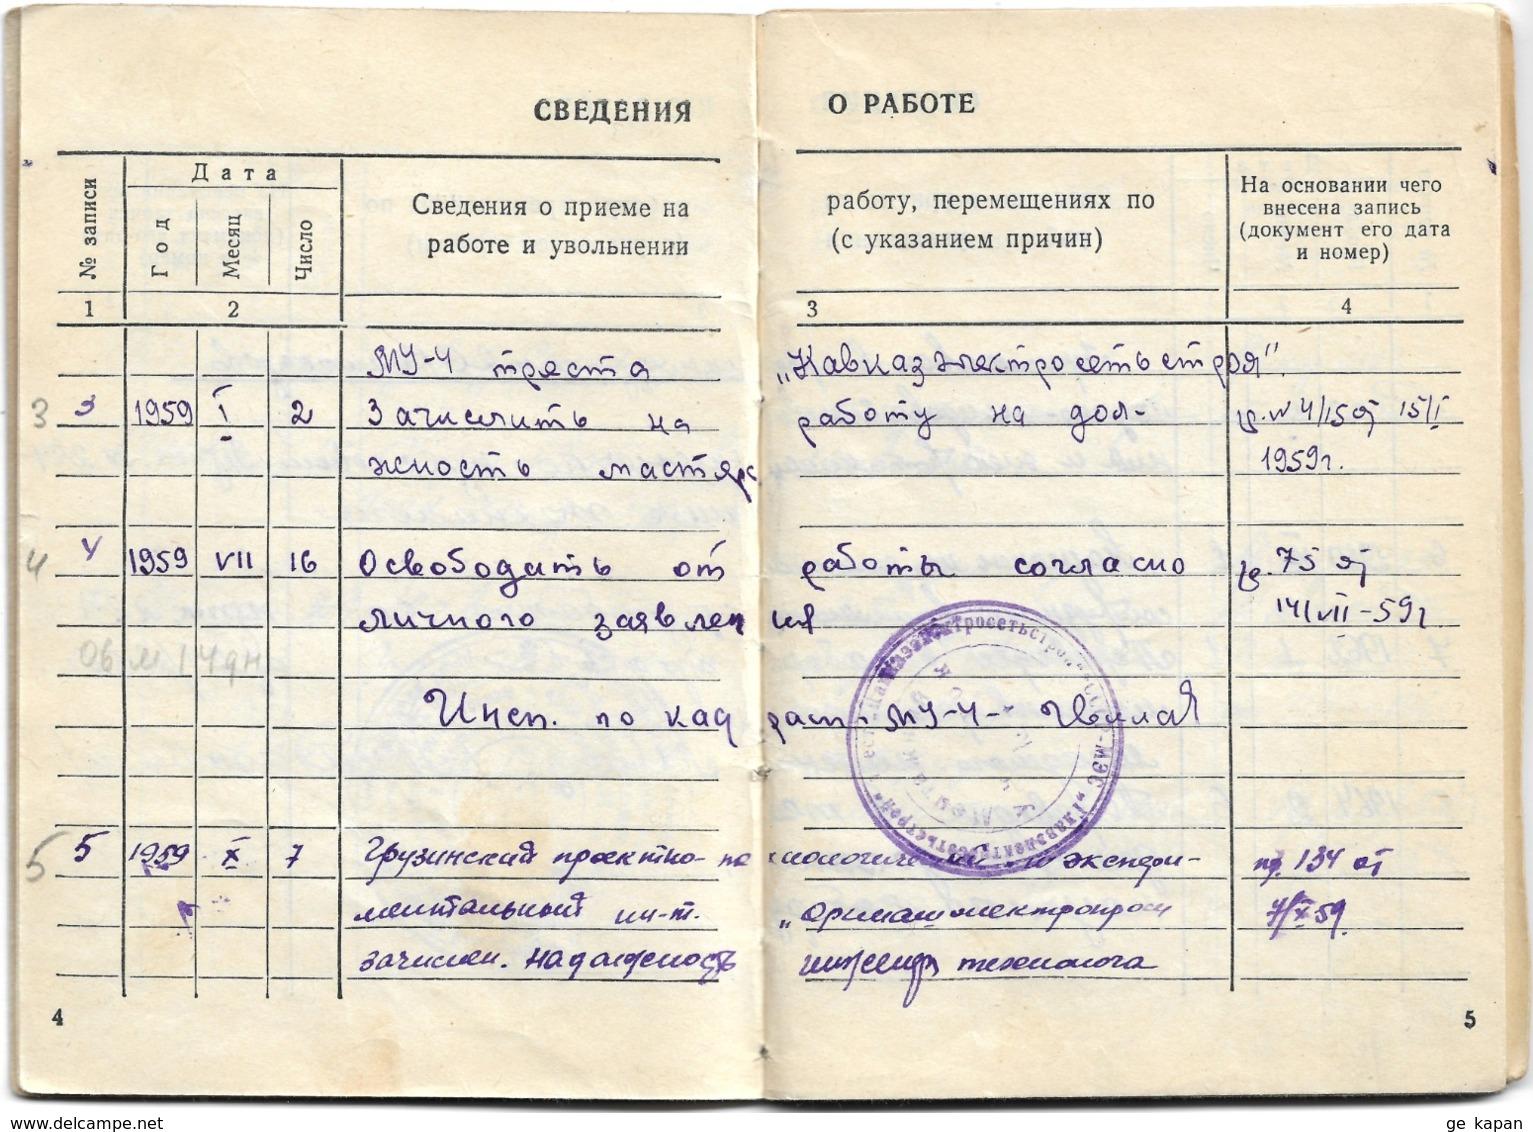 1959 USSR GEORGIA Bilingual Employment Record Book / трудовая книжка CCCP - Historical Documents